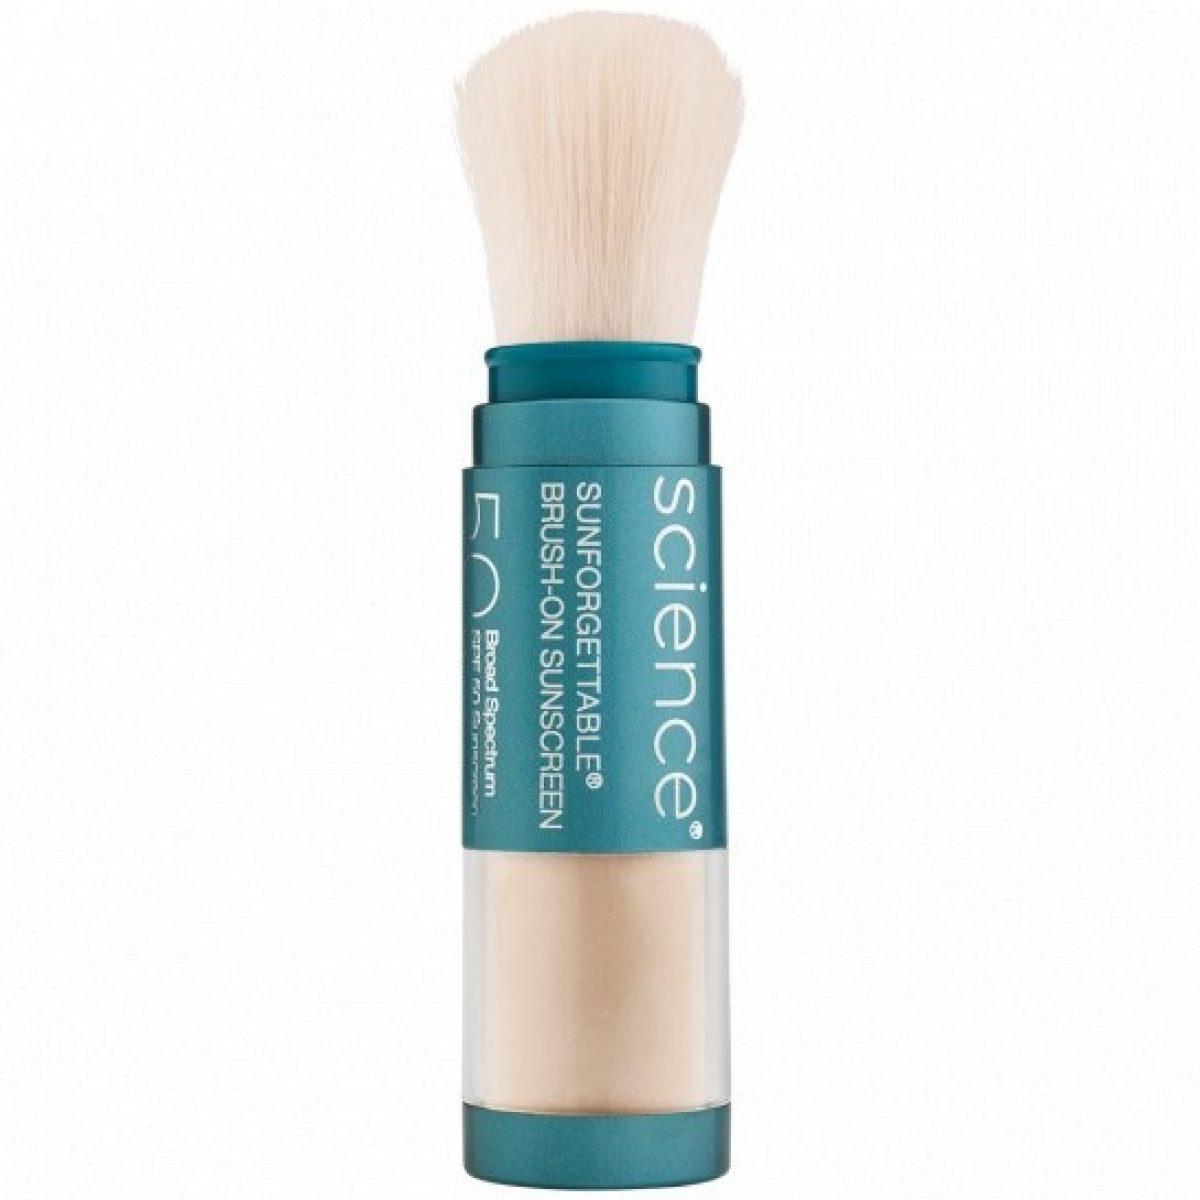 Sunforgettable Brush On Sunscreen SPF 50